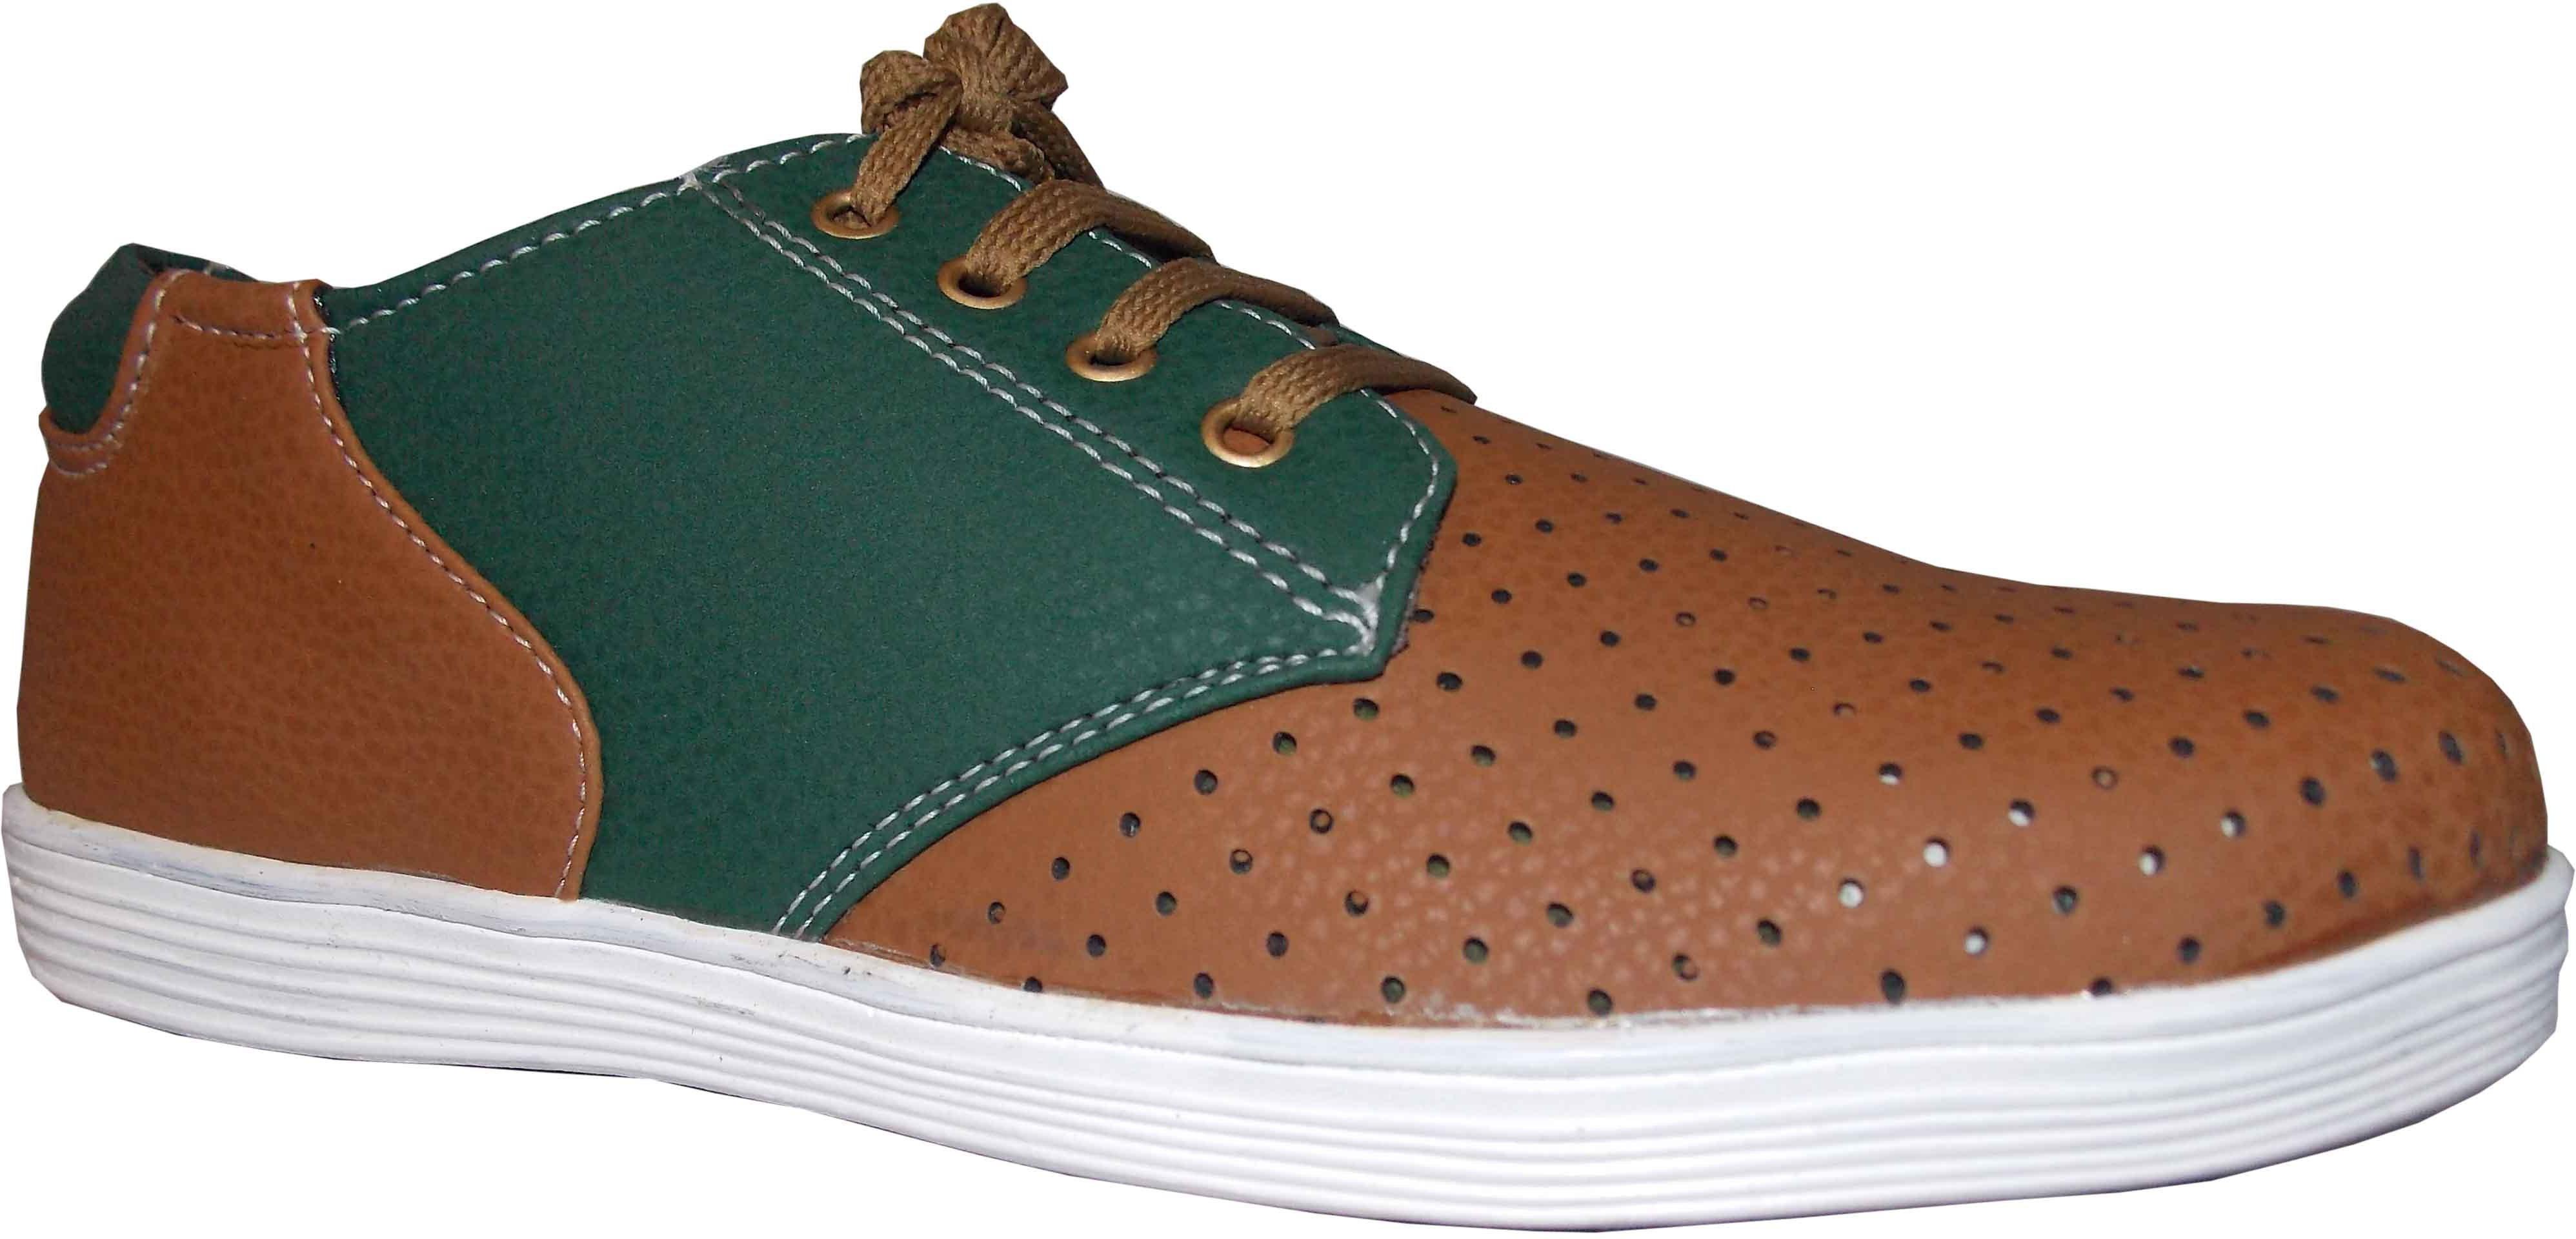 Ekora Casual Shoes